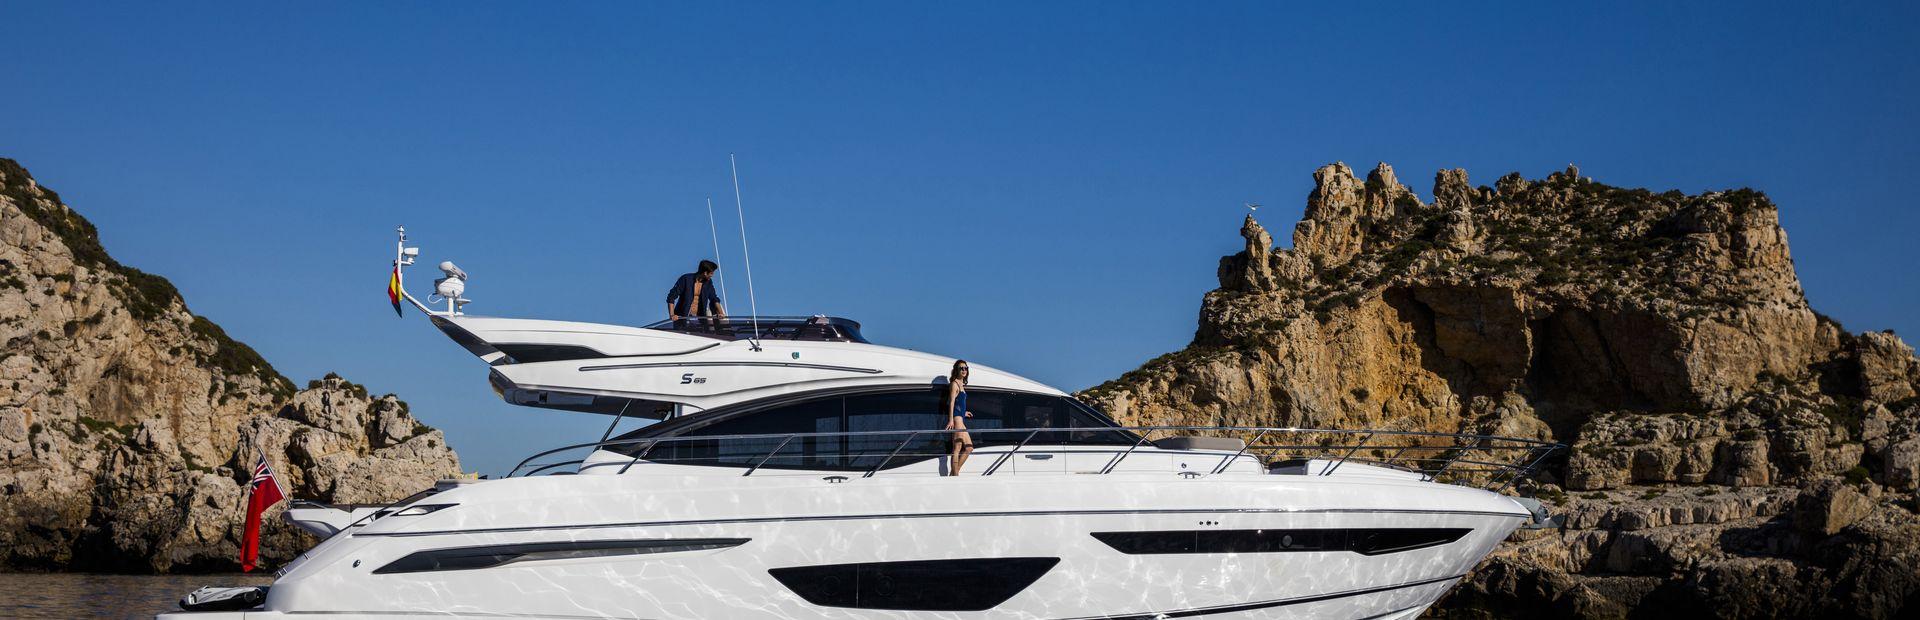 Princess S65 Yacht Charter